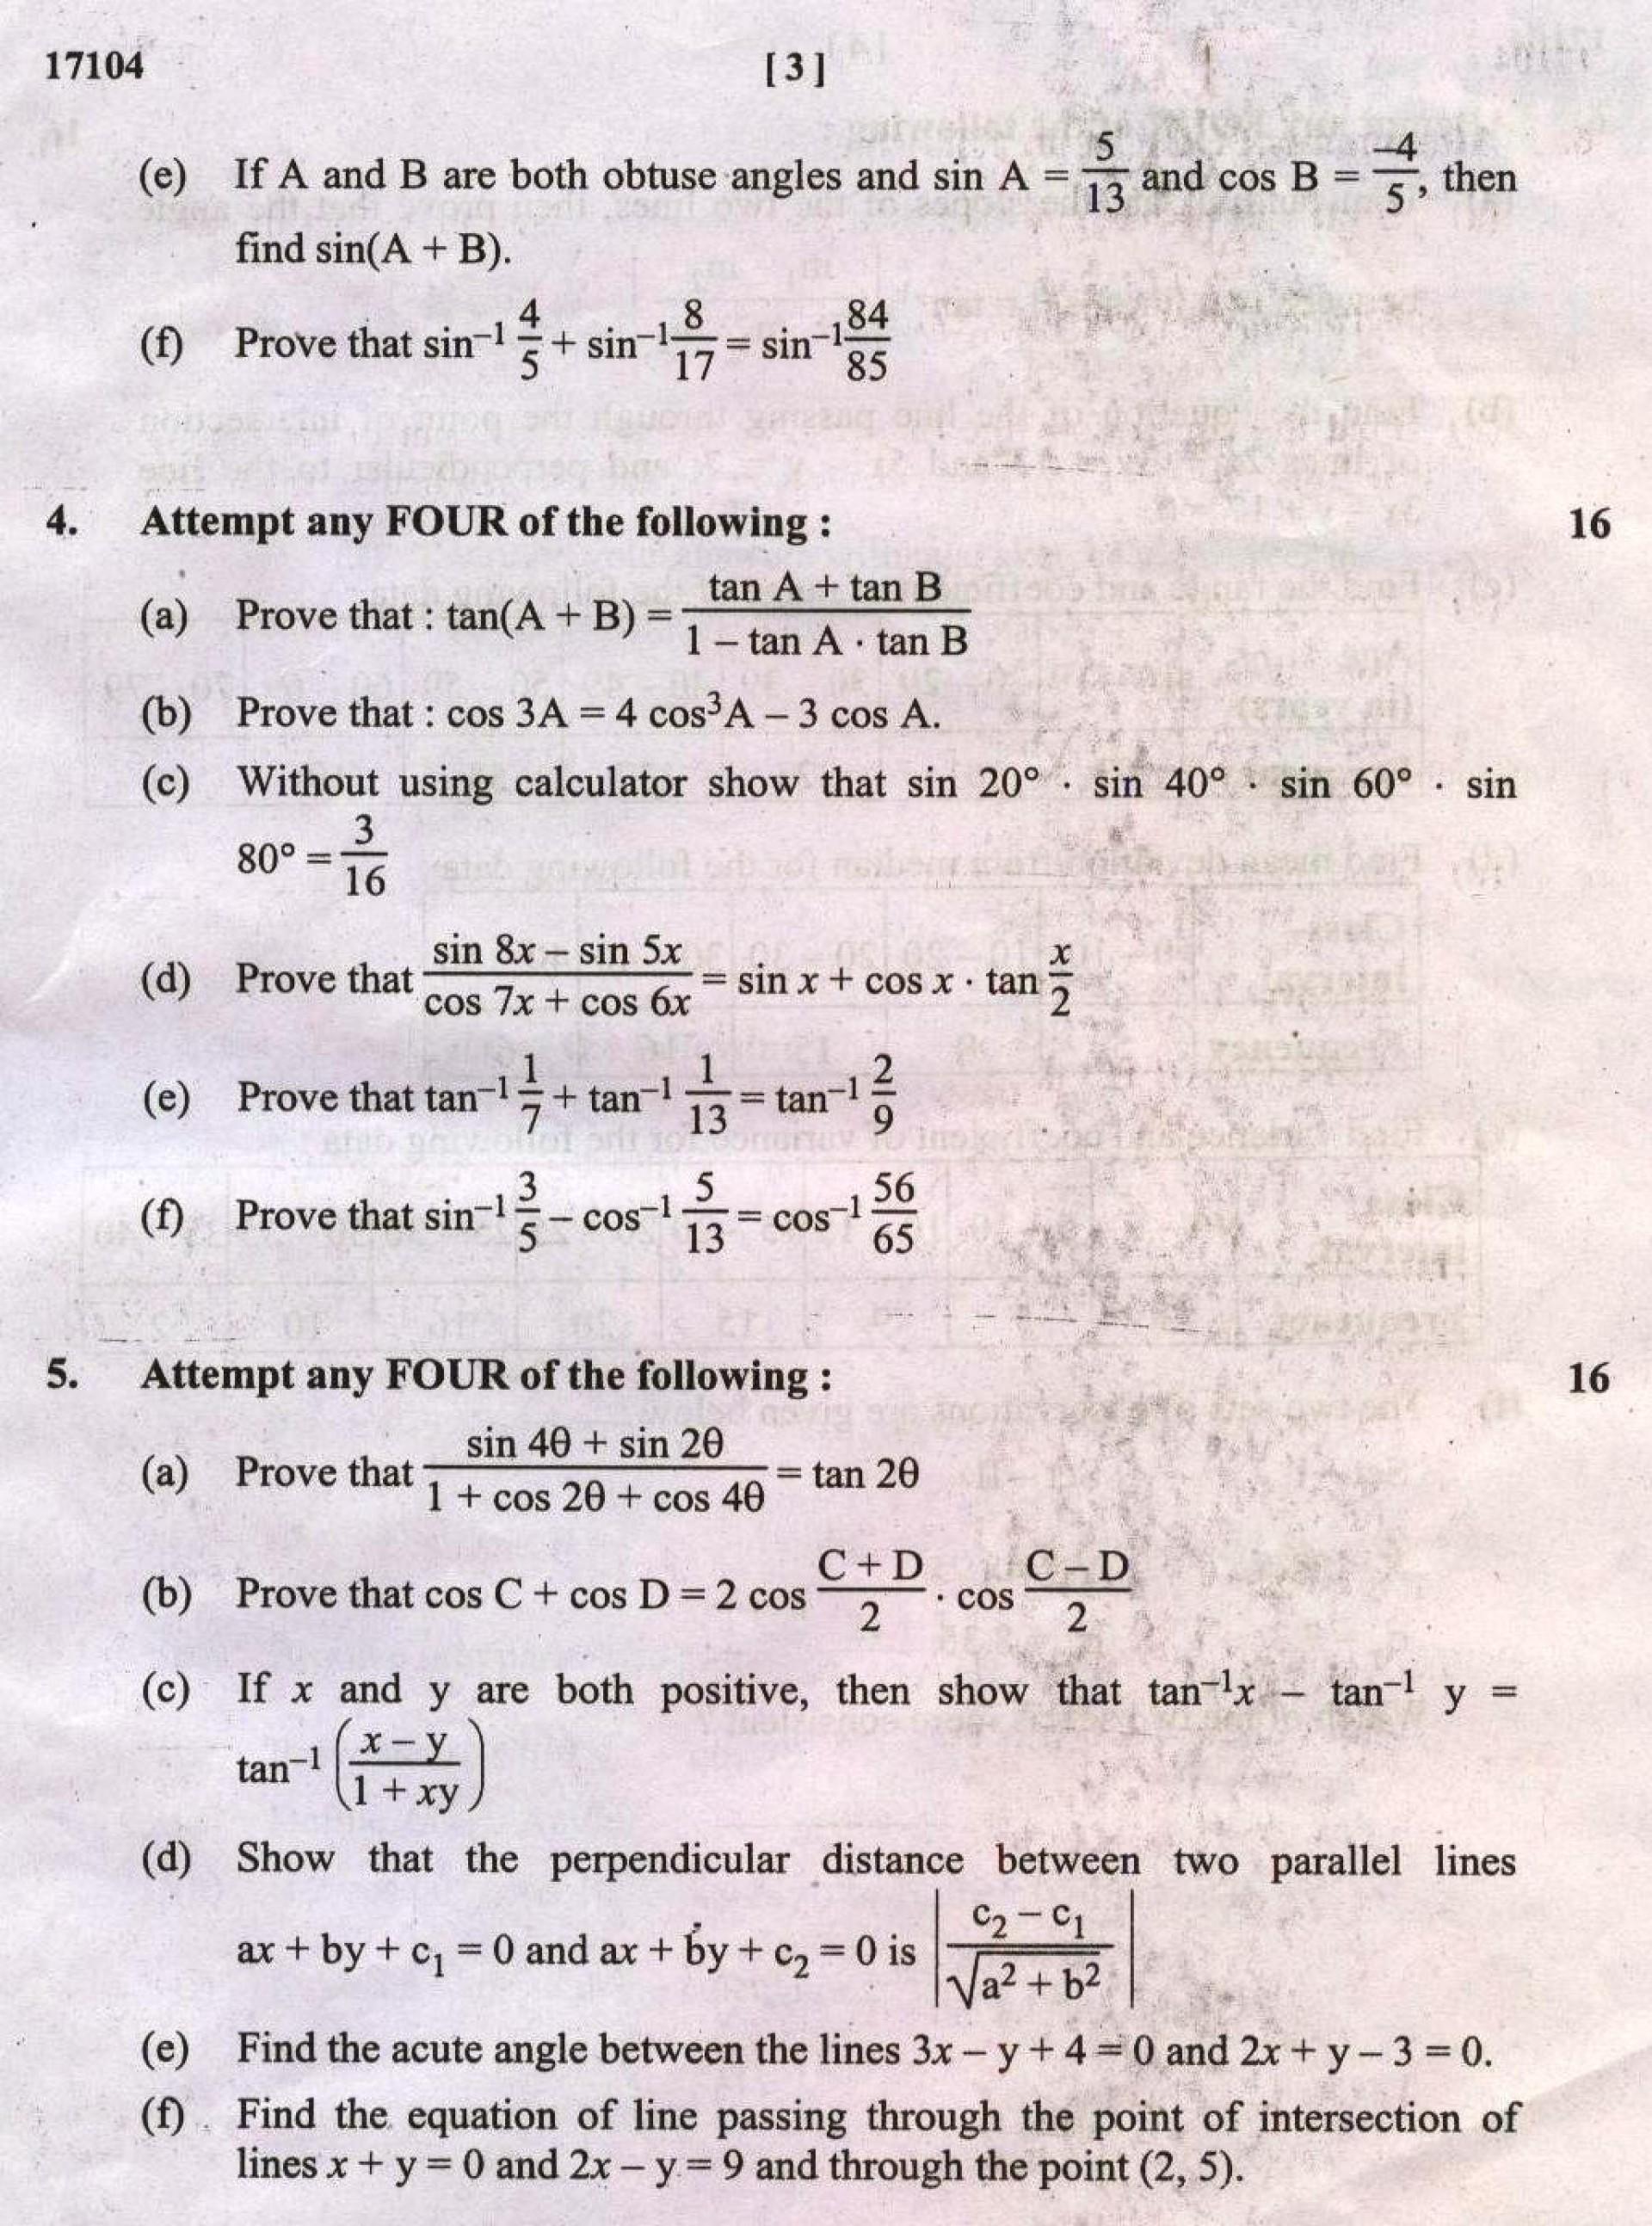 017 Thomas Jefferson Essay Example High School Admissions Test Topic Basic Mathematics All English Questions Economics Sample Scholarship Hunter Biology Magnificent 1920